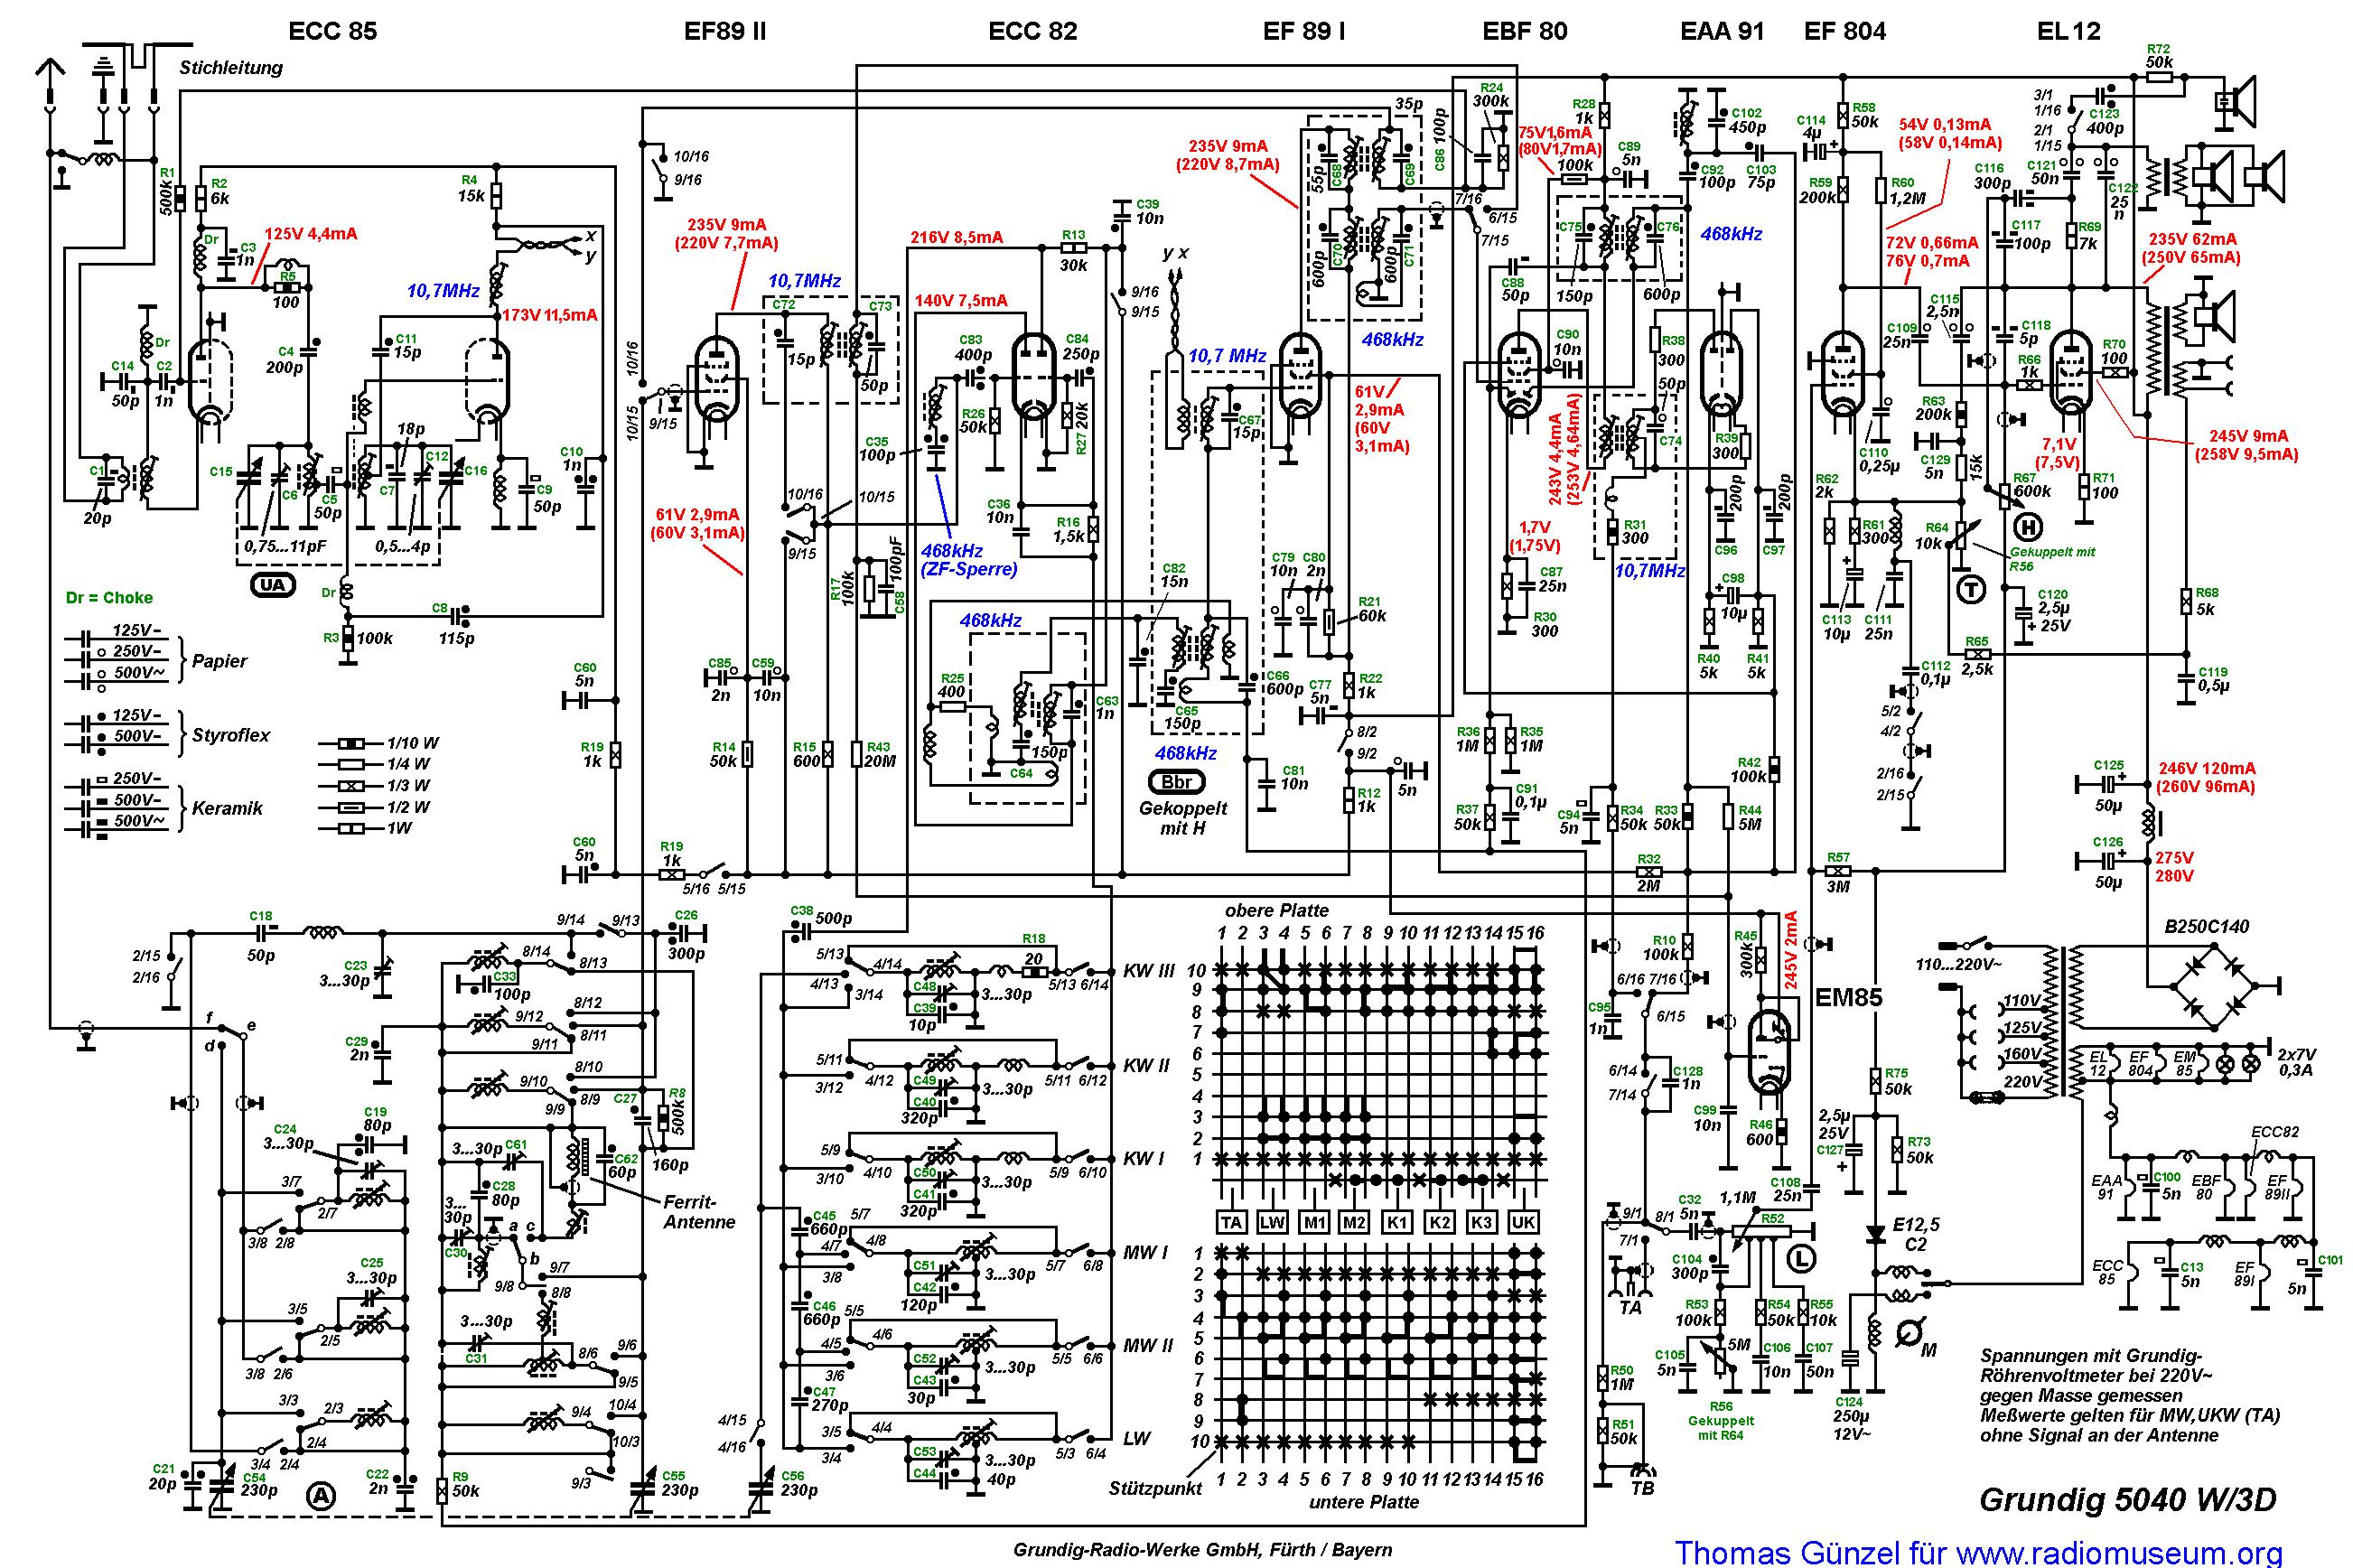 Deere Radio Wiring Diagram 26 Images John Delphi D Grundig 5040w 3d Sch Forum V1 1 Stereo